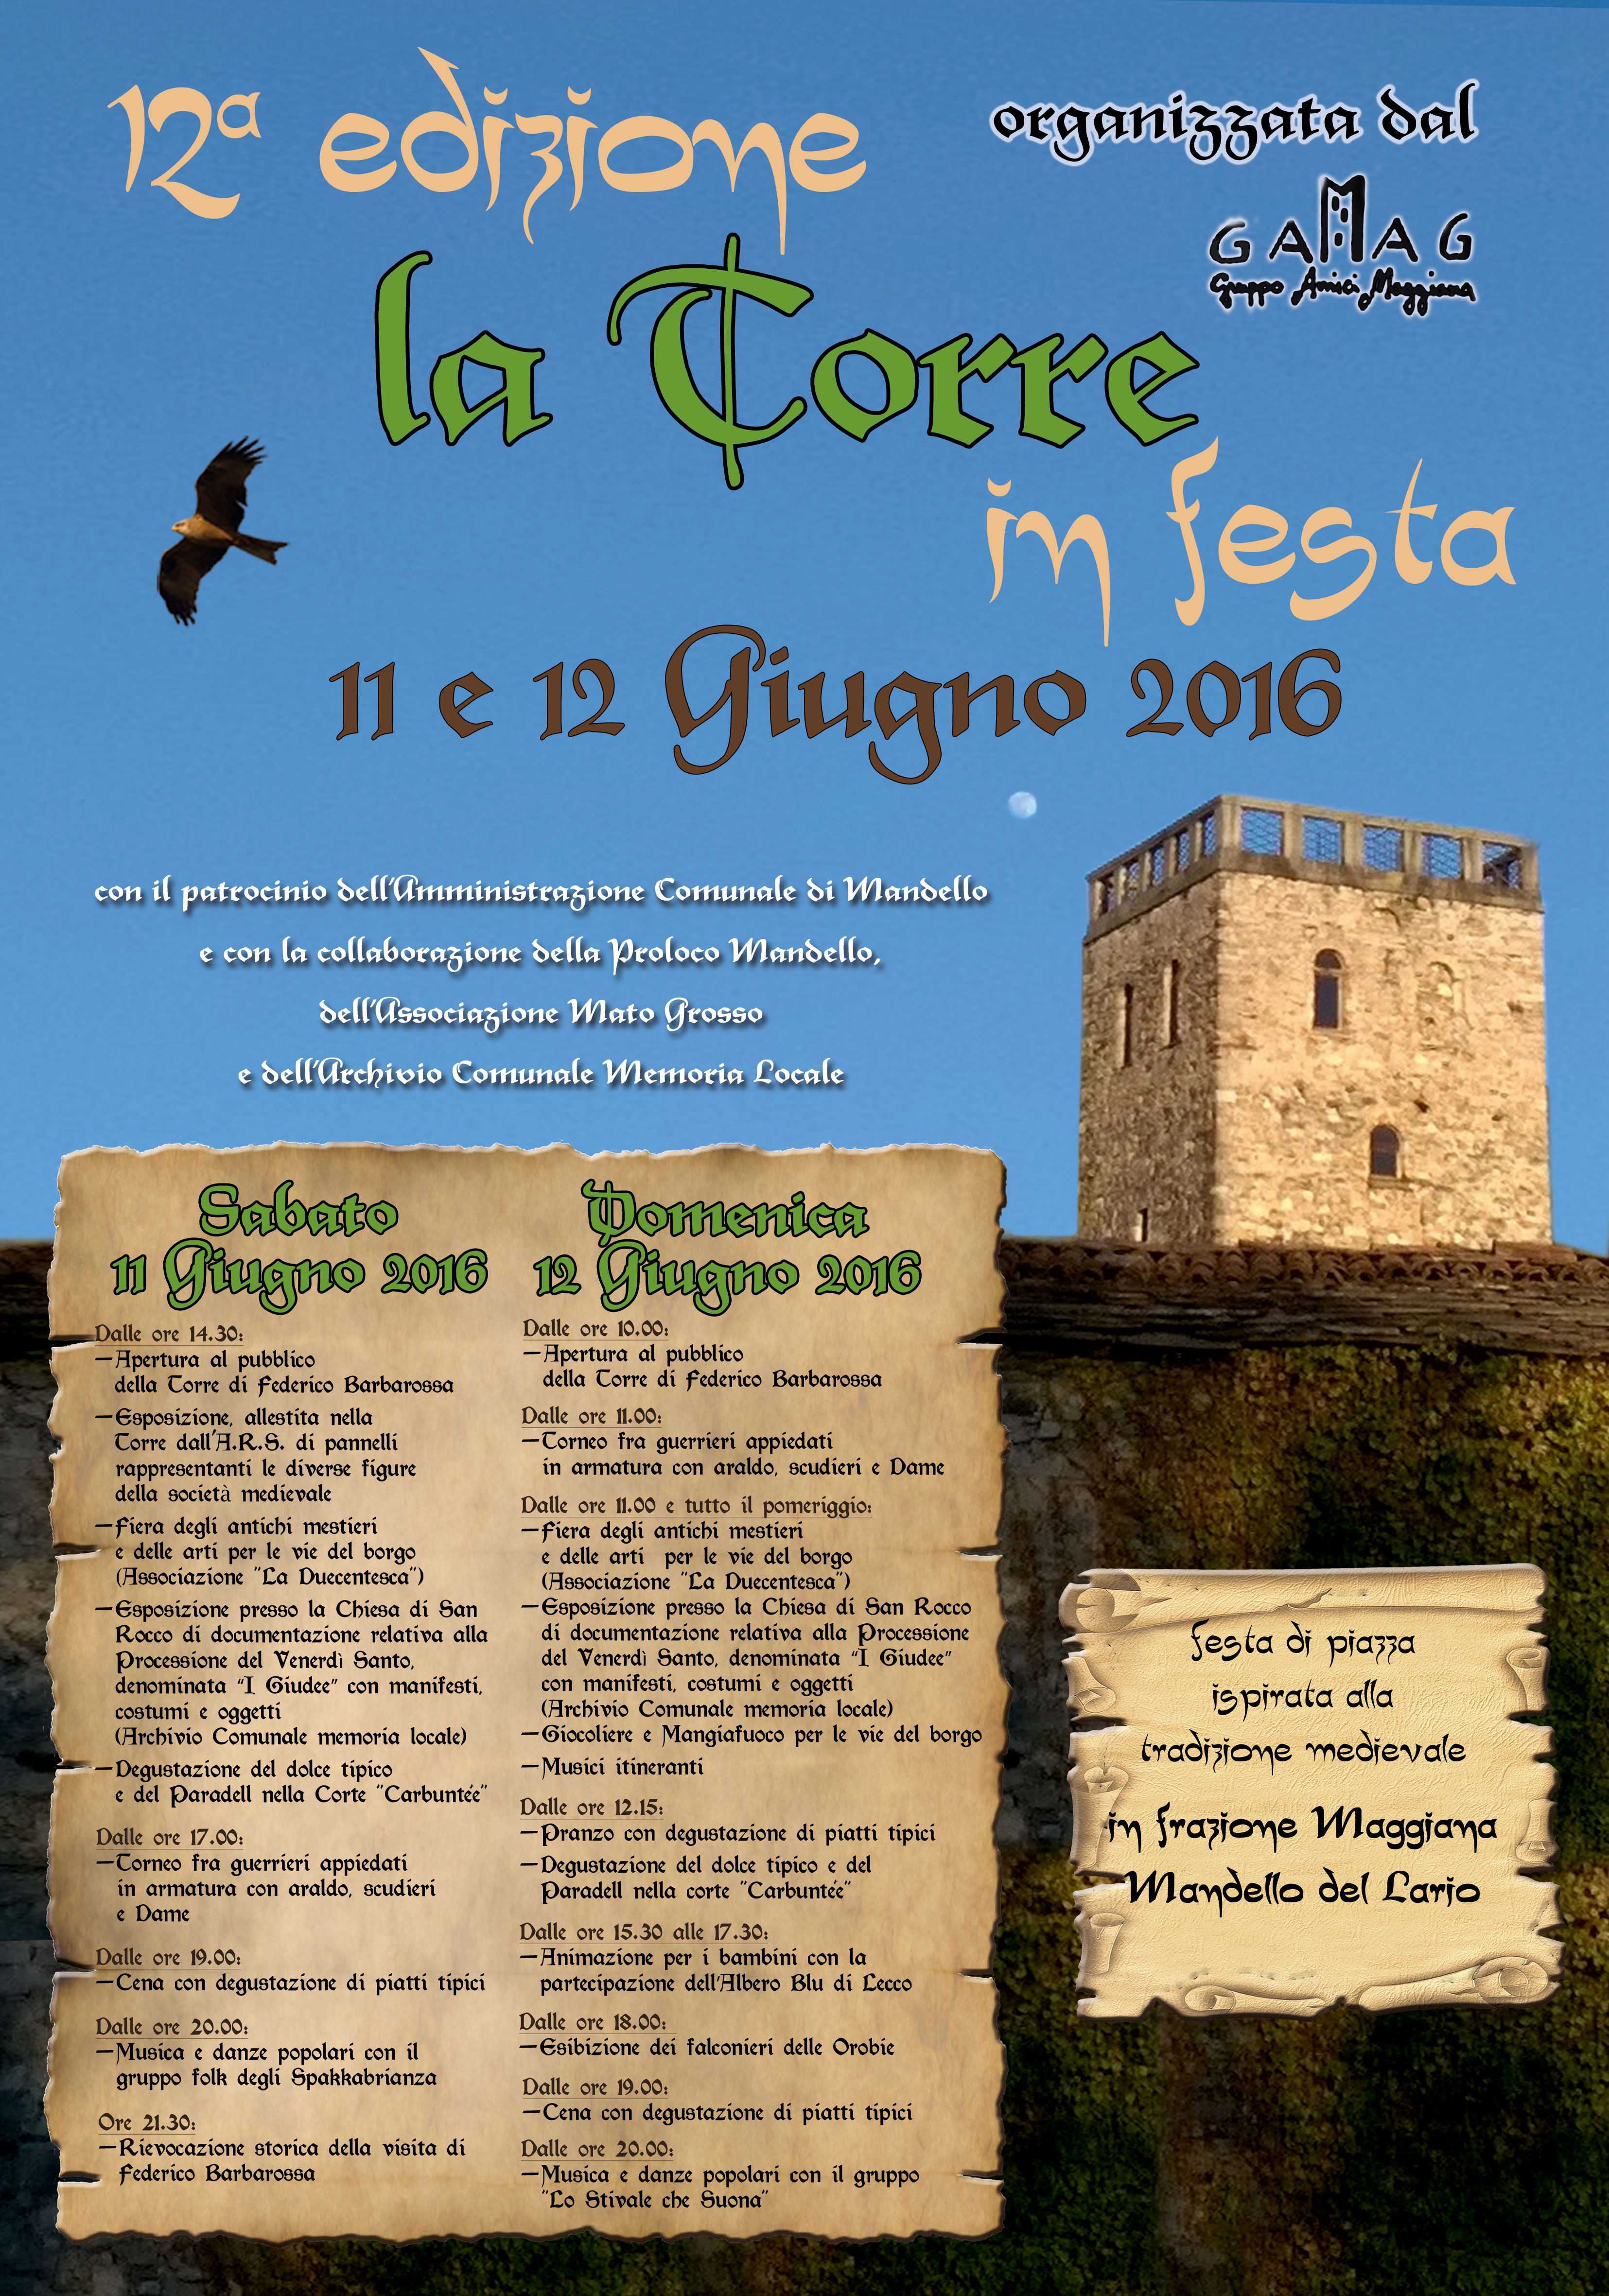 maggiana la torre in festa 2016